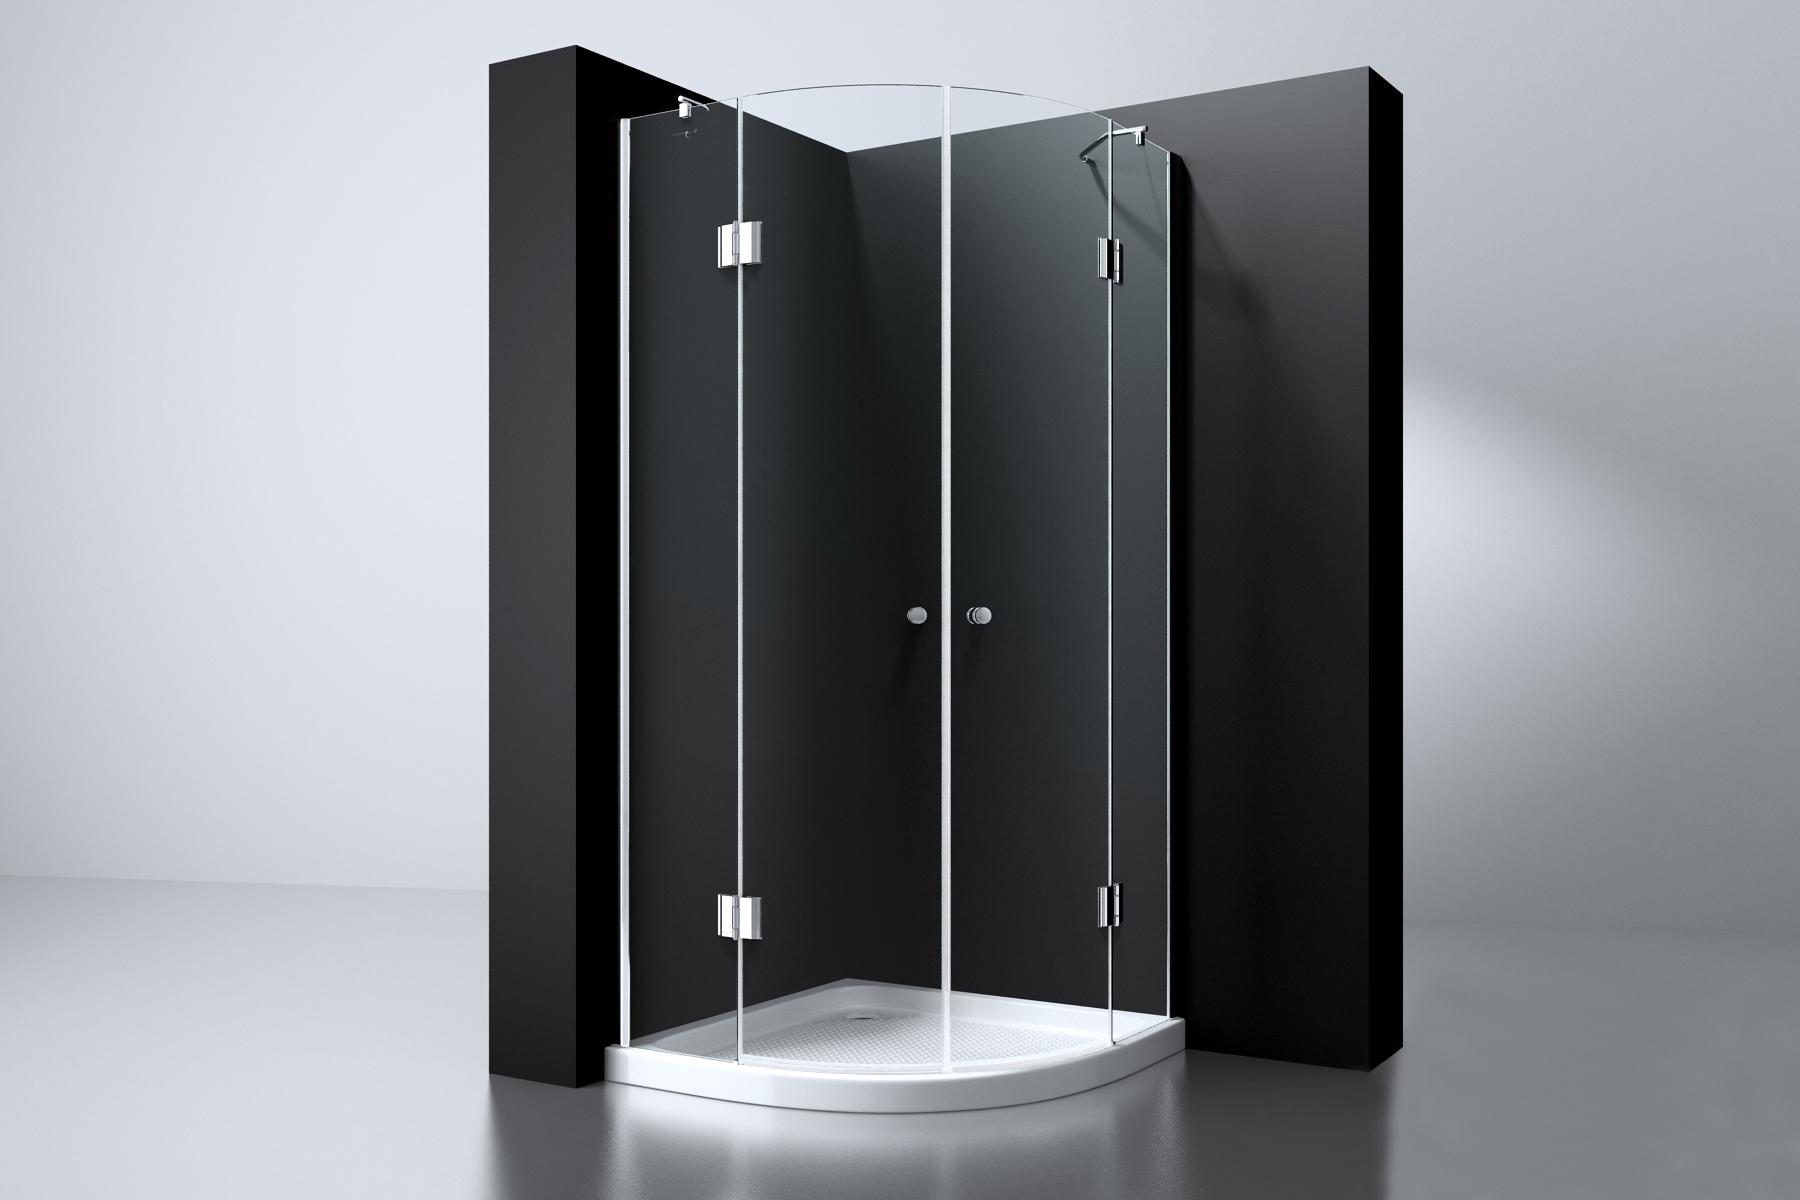 Best Design Arek kwartronde douchecabine 100x100cm ANTI-KALK